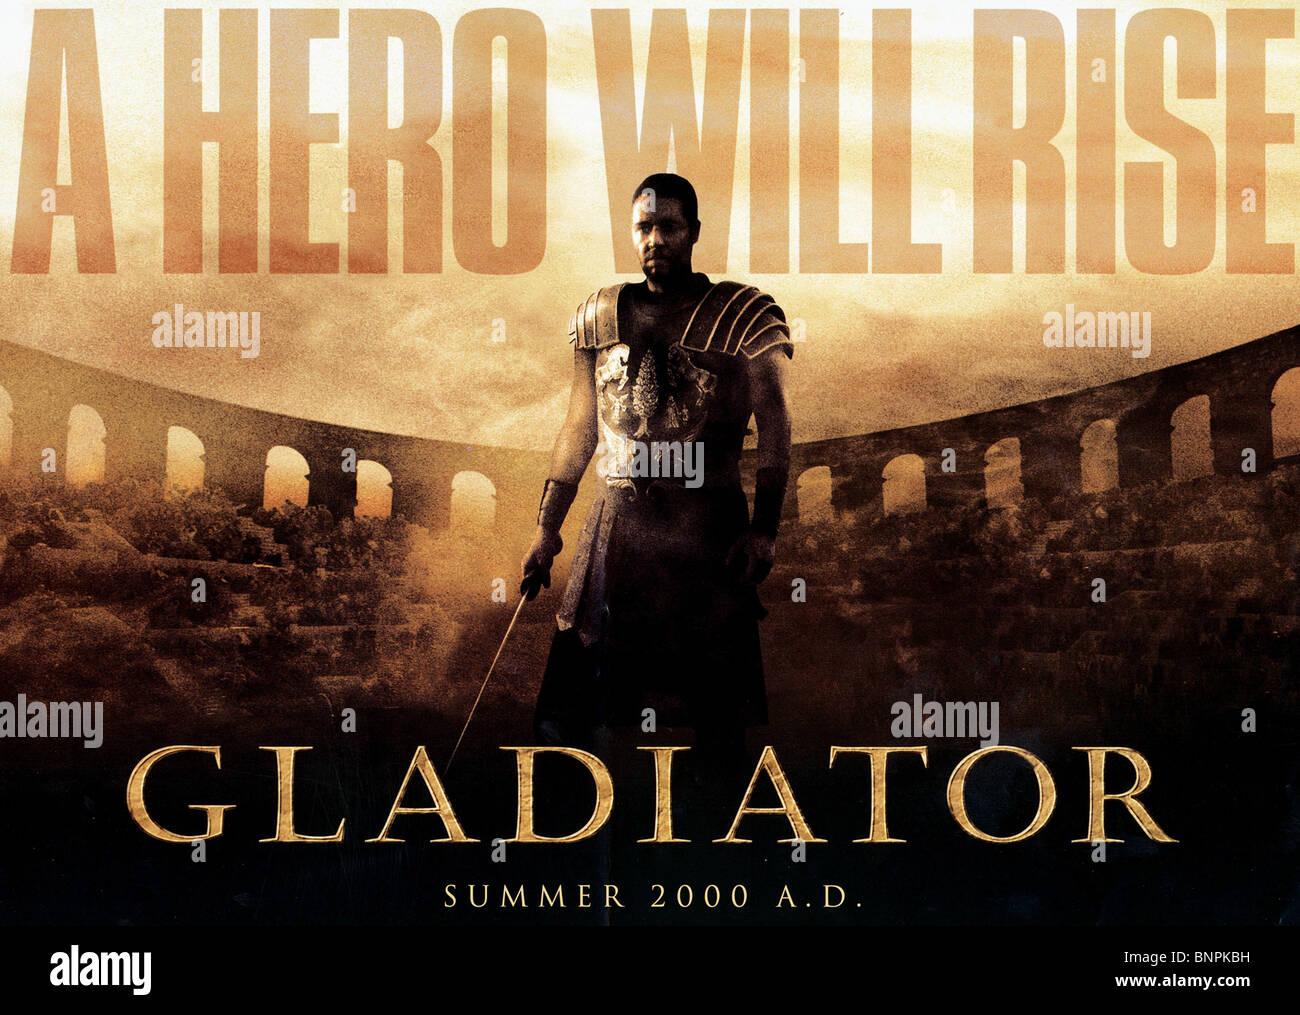 gladiator film poster stockfotos und